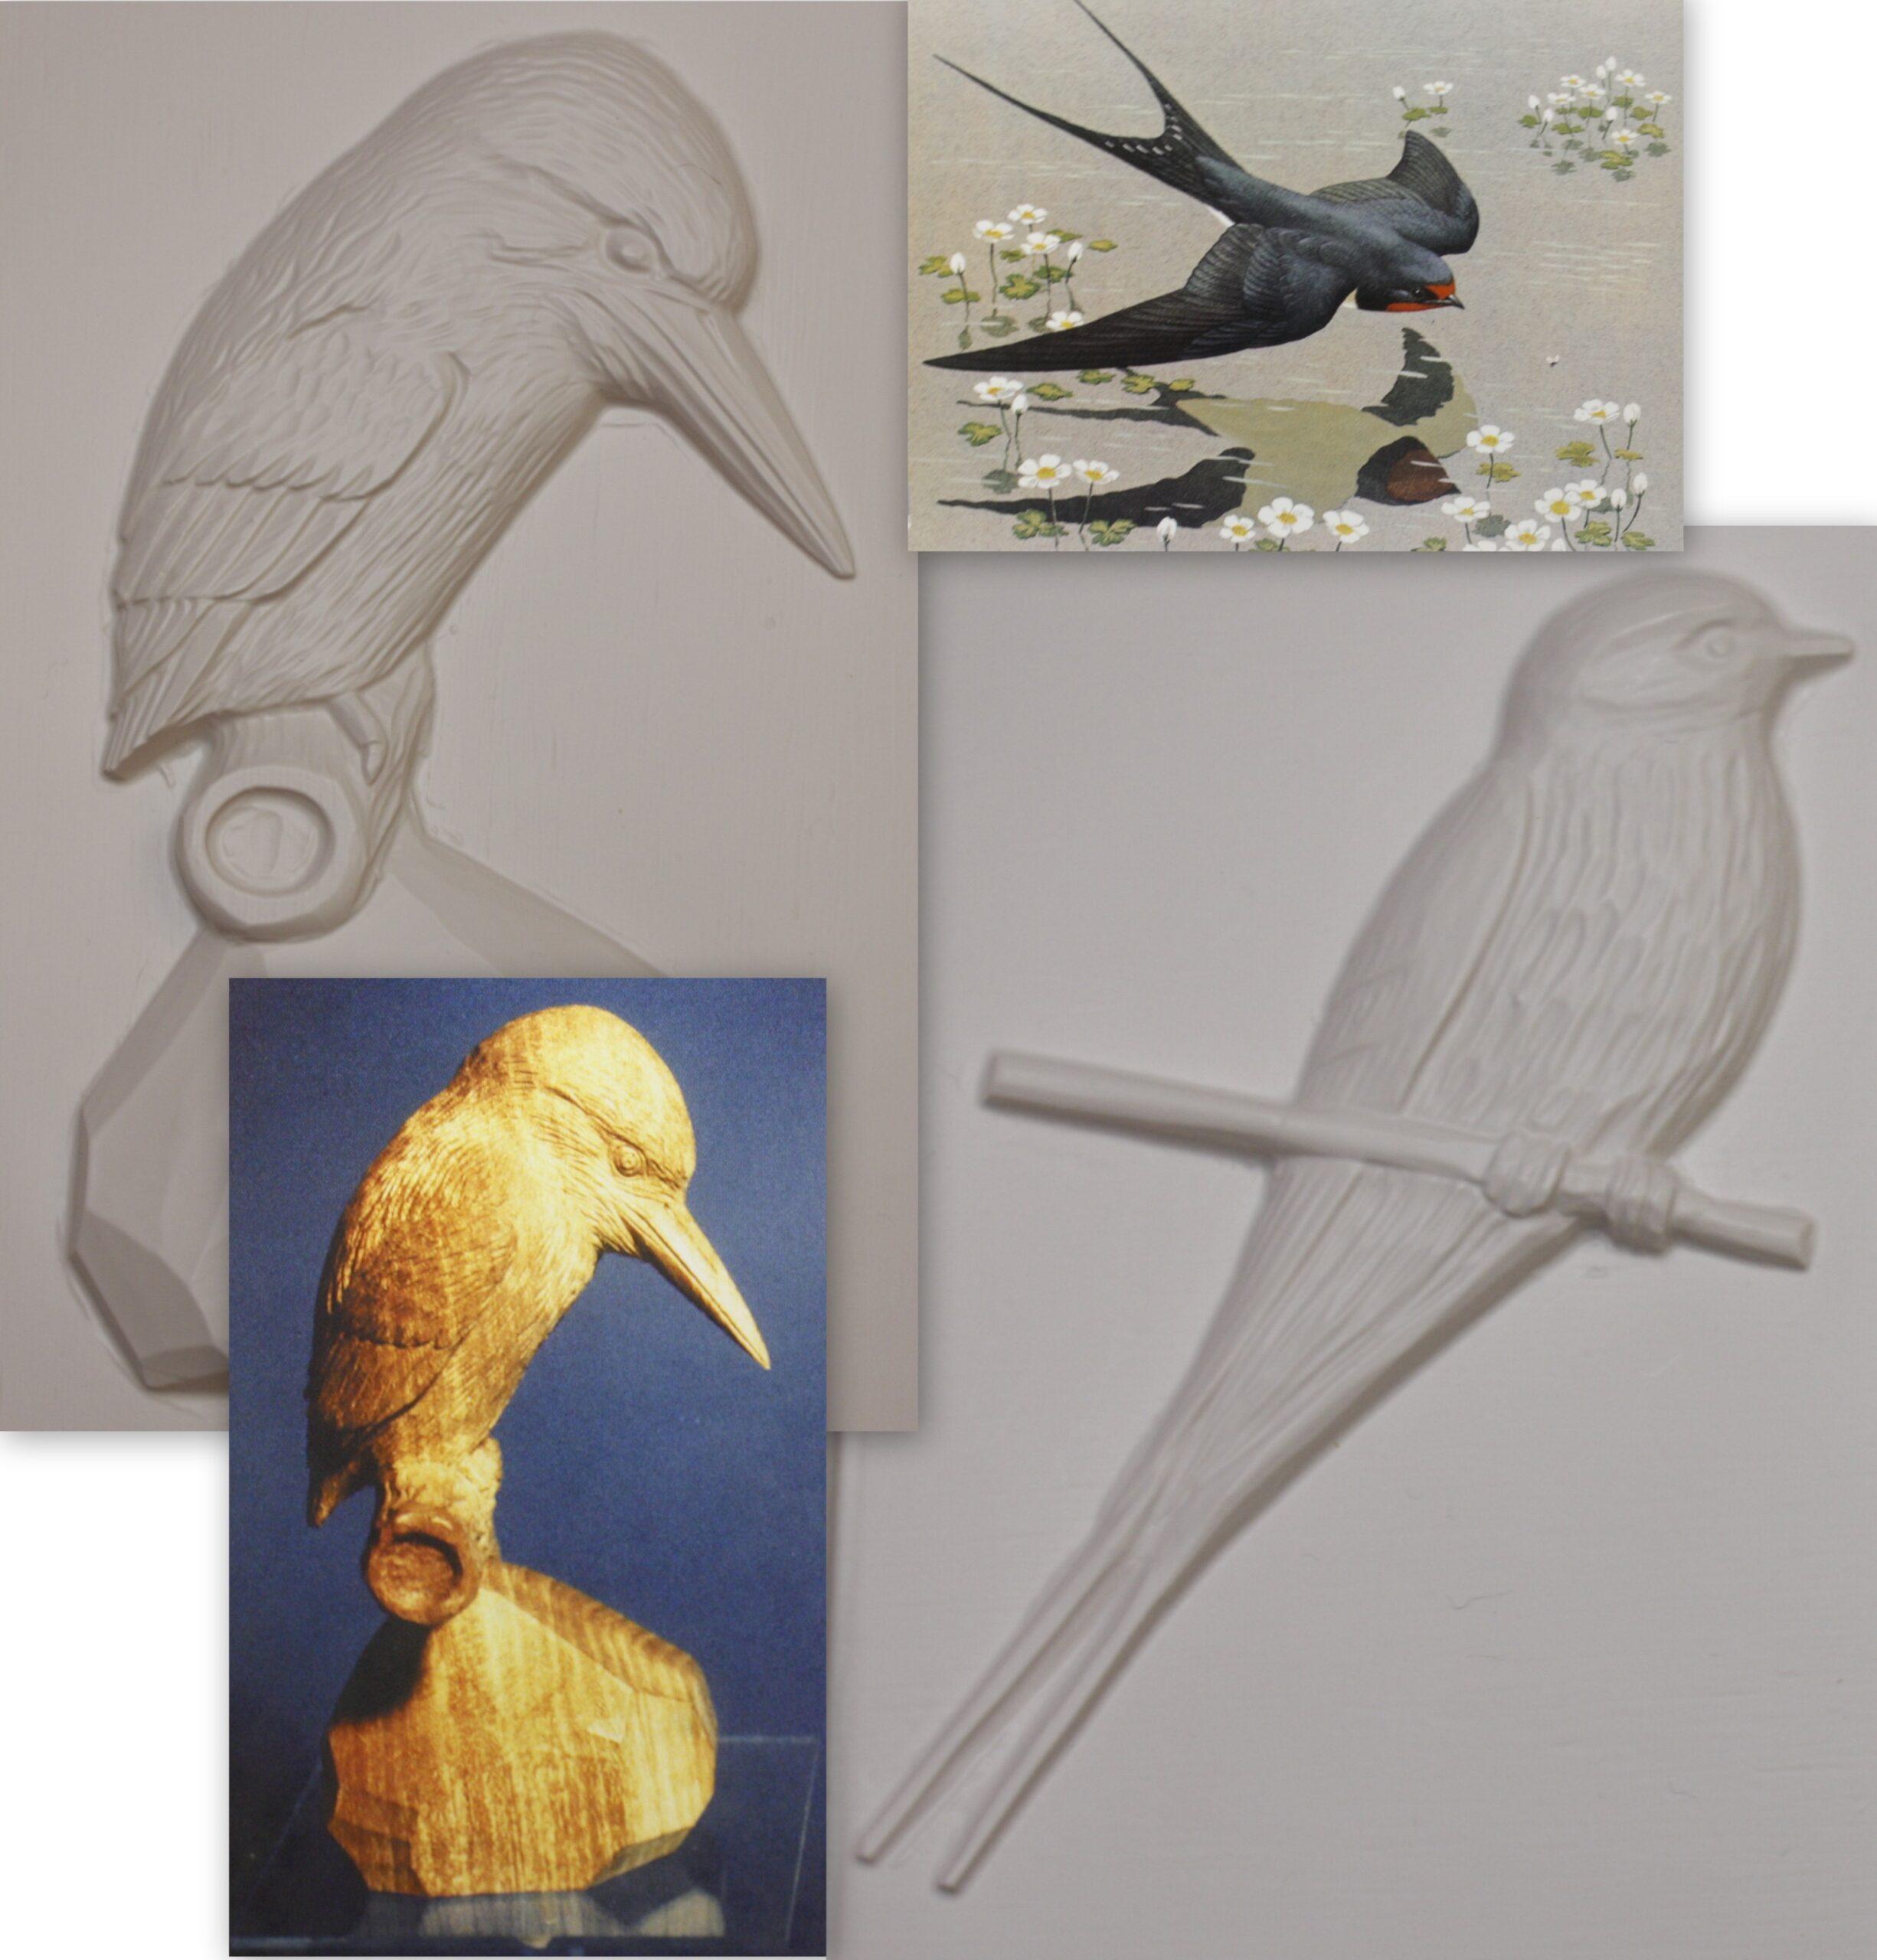 Album 17 British Birds by Living Paintings